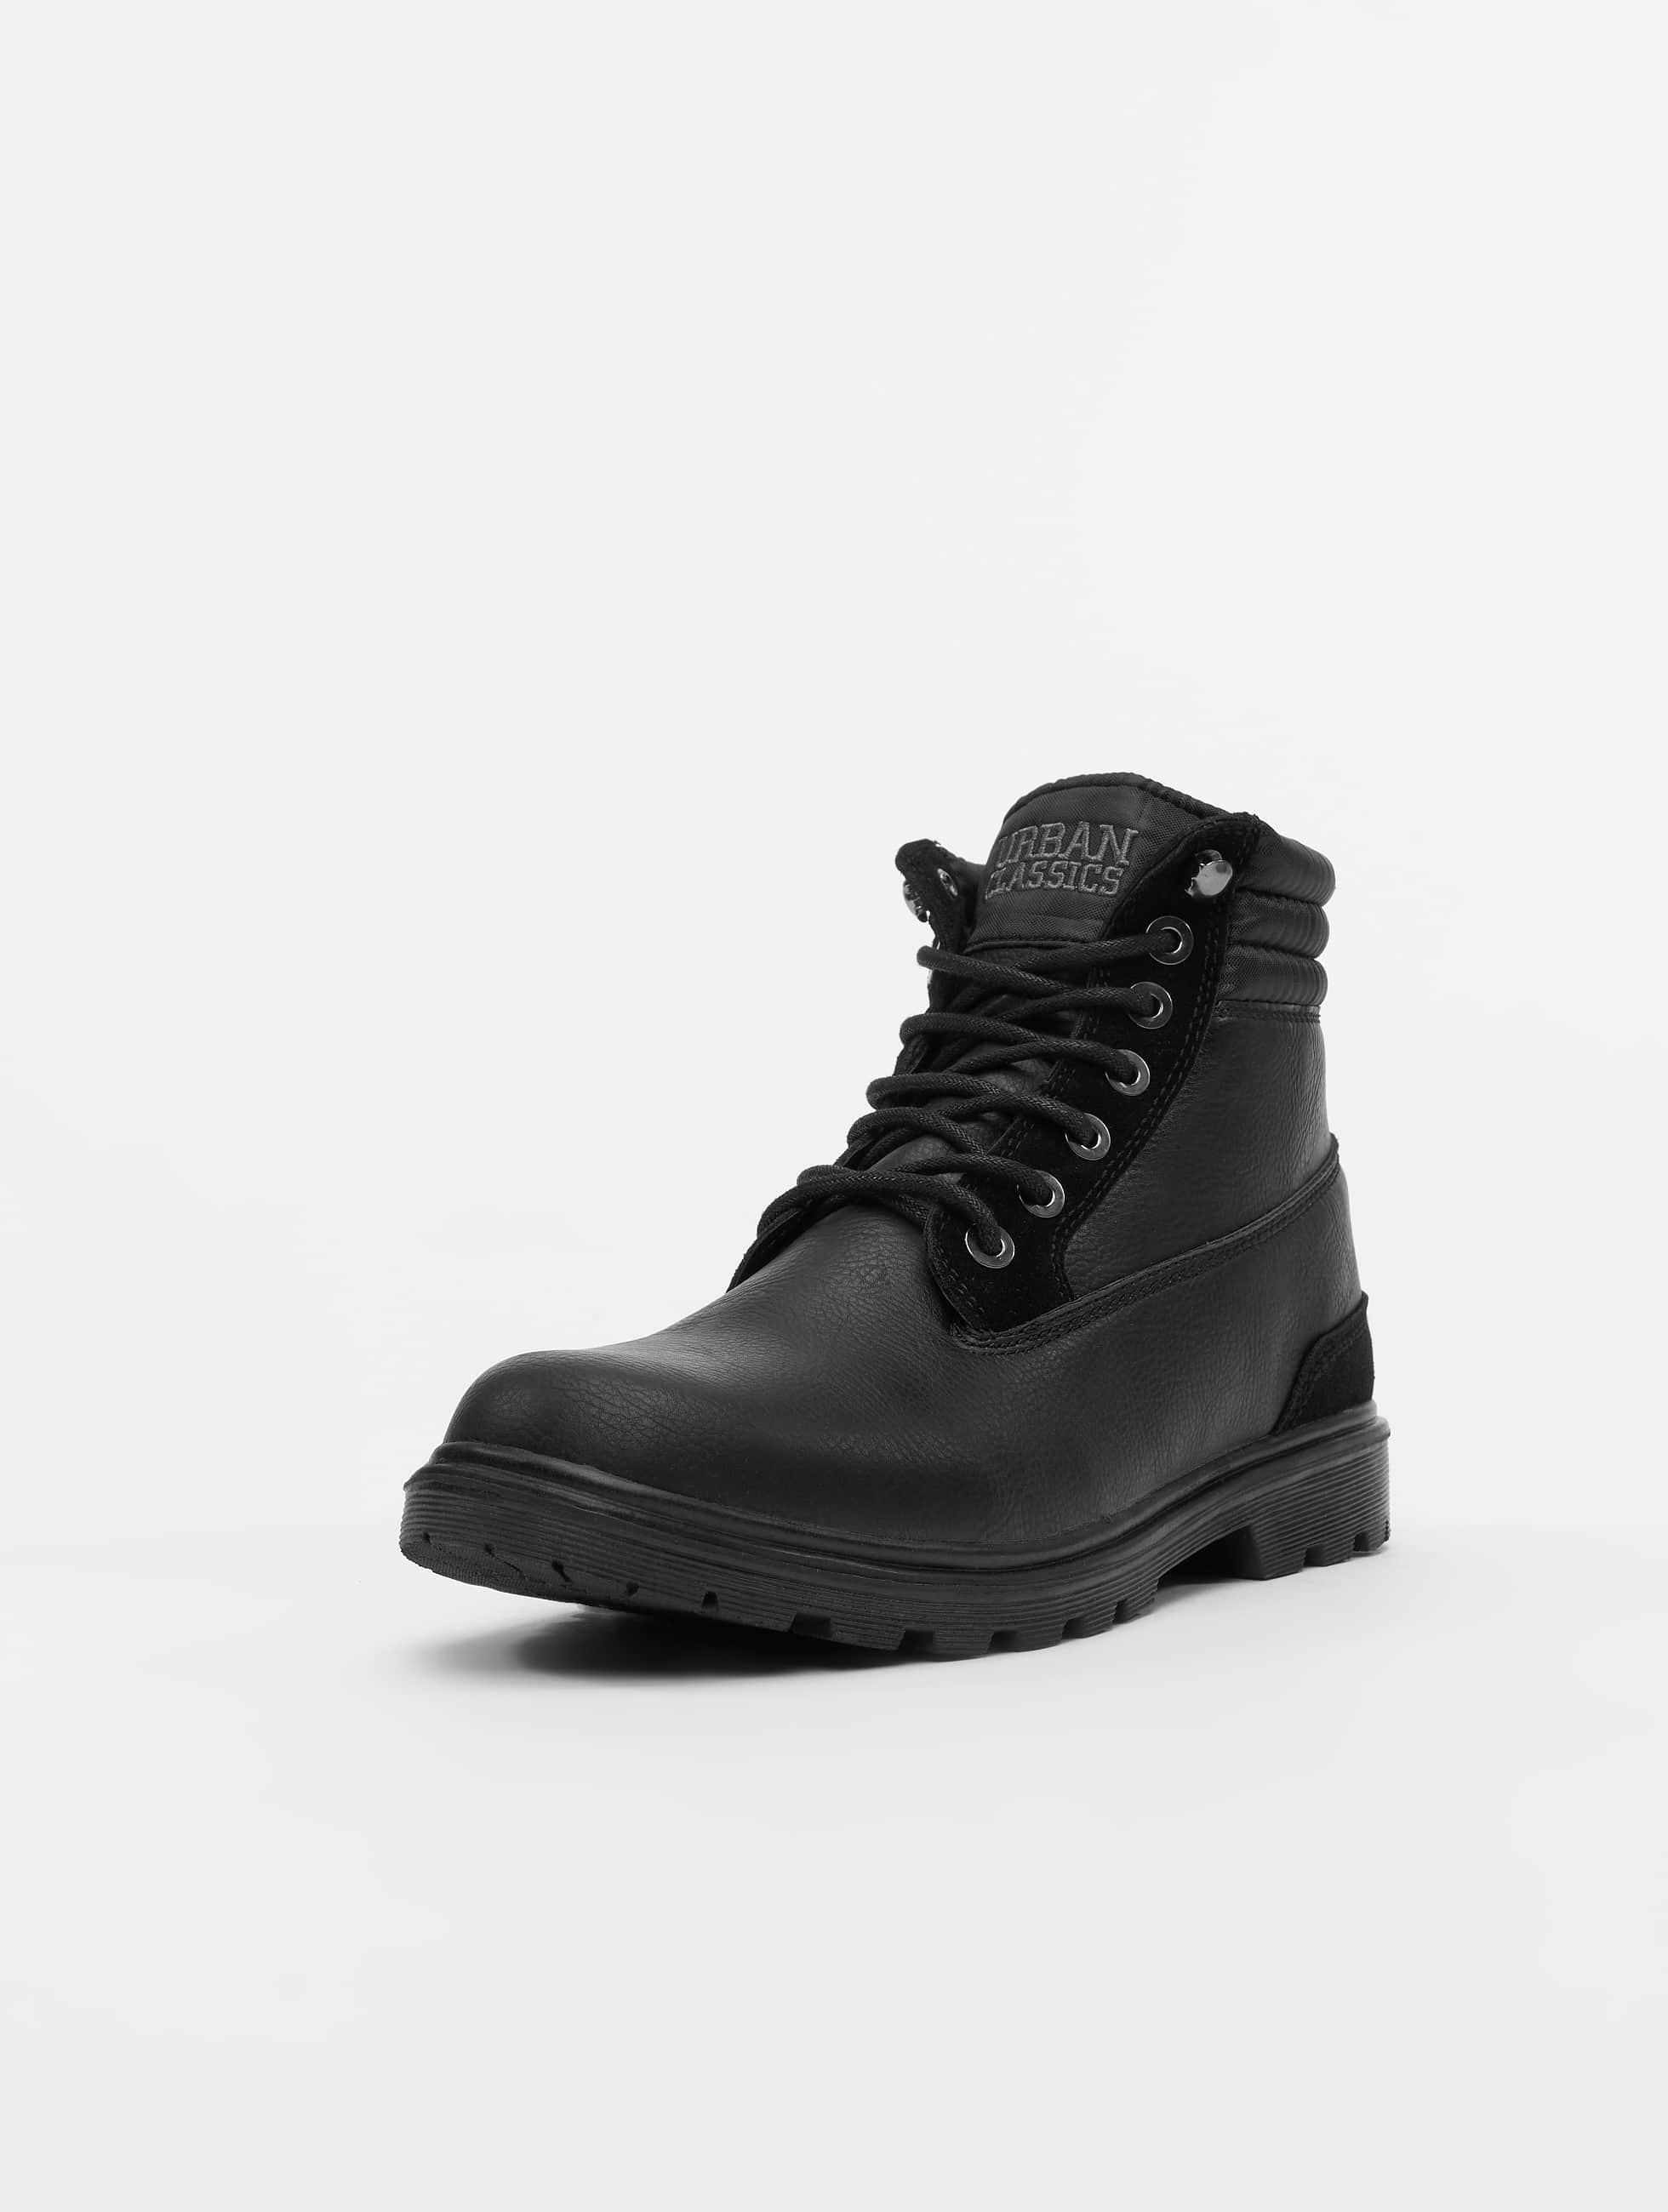 Urban Classics Vapaa-ajan kengät Winter musta